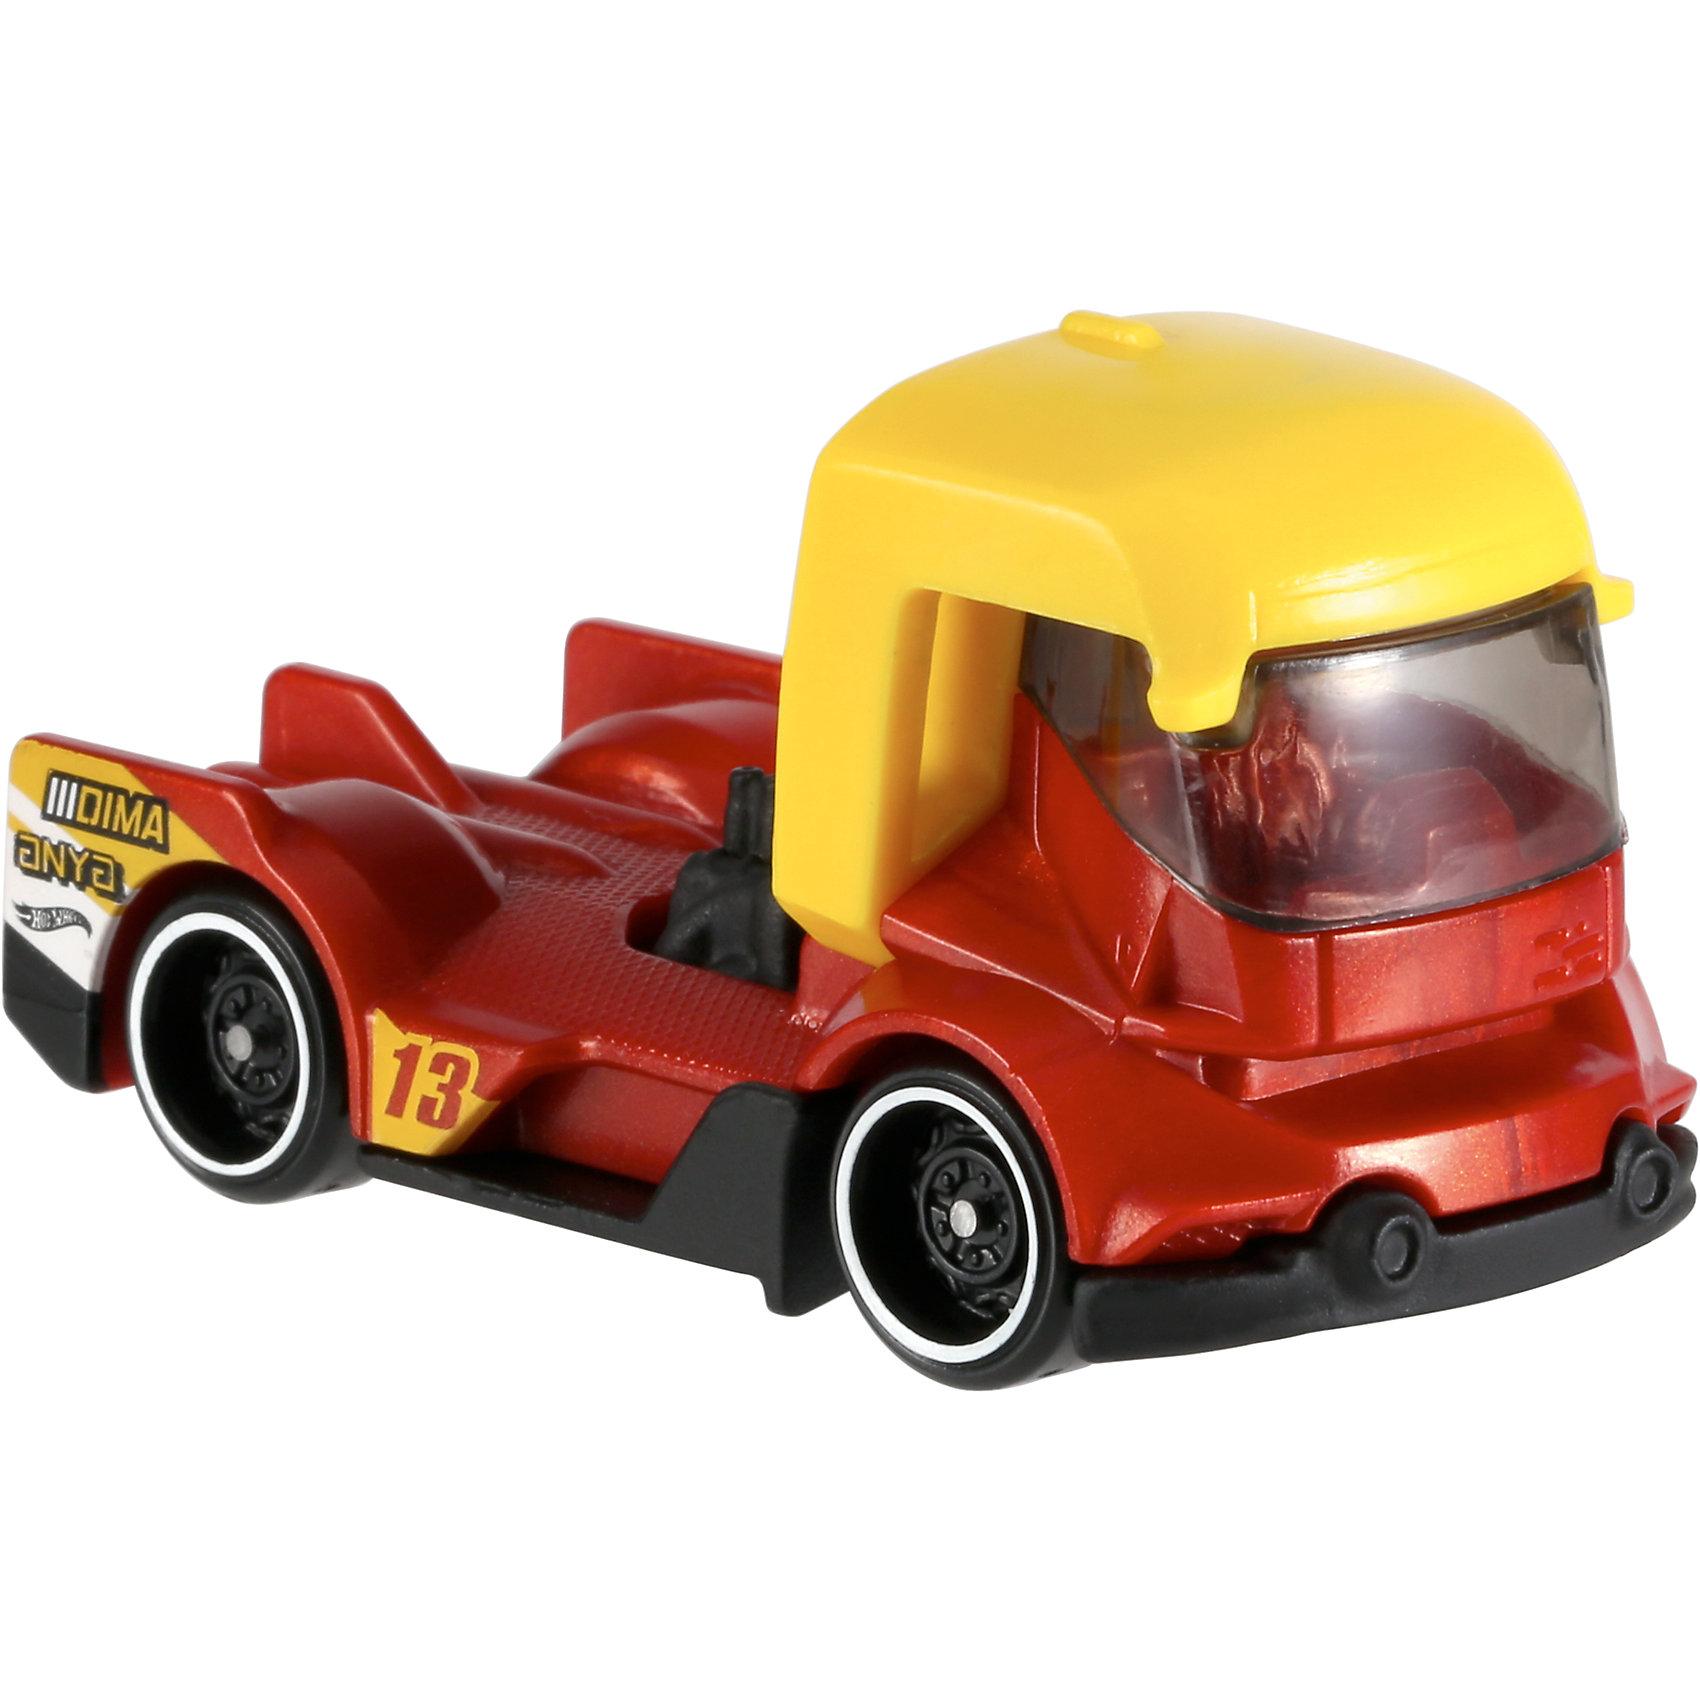 Базовая машинка Hot Wheels, Rig HeatПопулярные игрушки<br><br><br>Ширина мм: 110<br>Глубина мм: 45<br>Высота мм: 110<br>Вес г: 30<br>Возраст от месяцев: 36<br>Возраст до месяцев: 96<br>Пол: Мужской<br>Возраст: Детский<br>SKU: 7111083